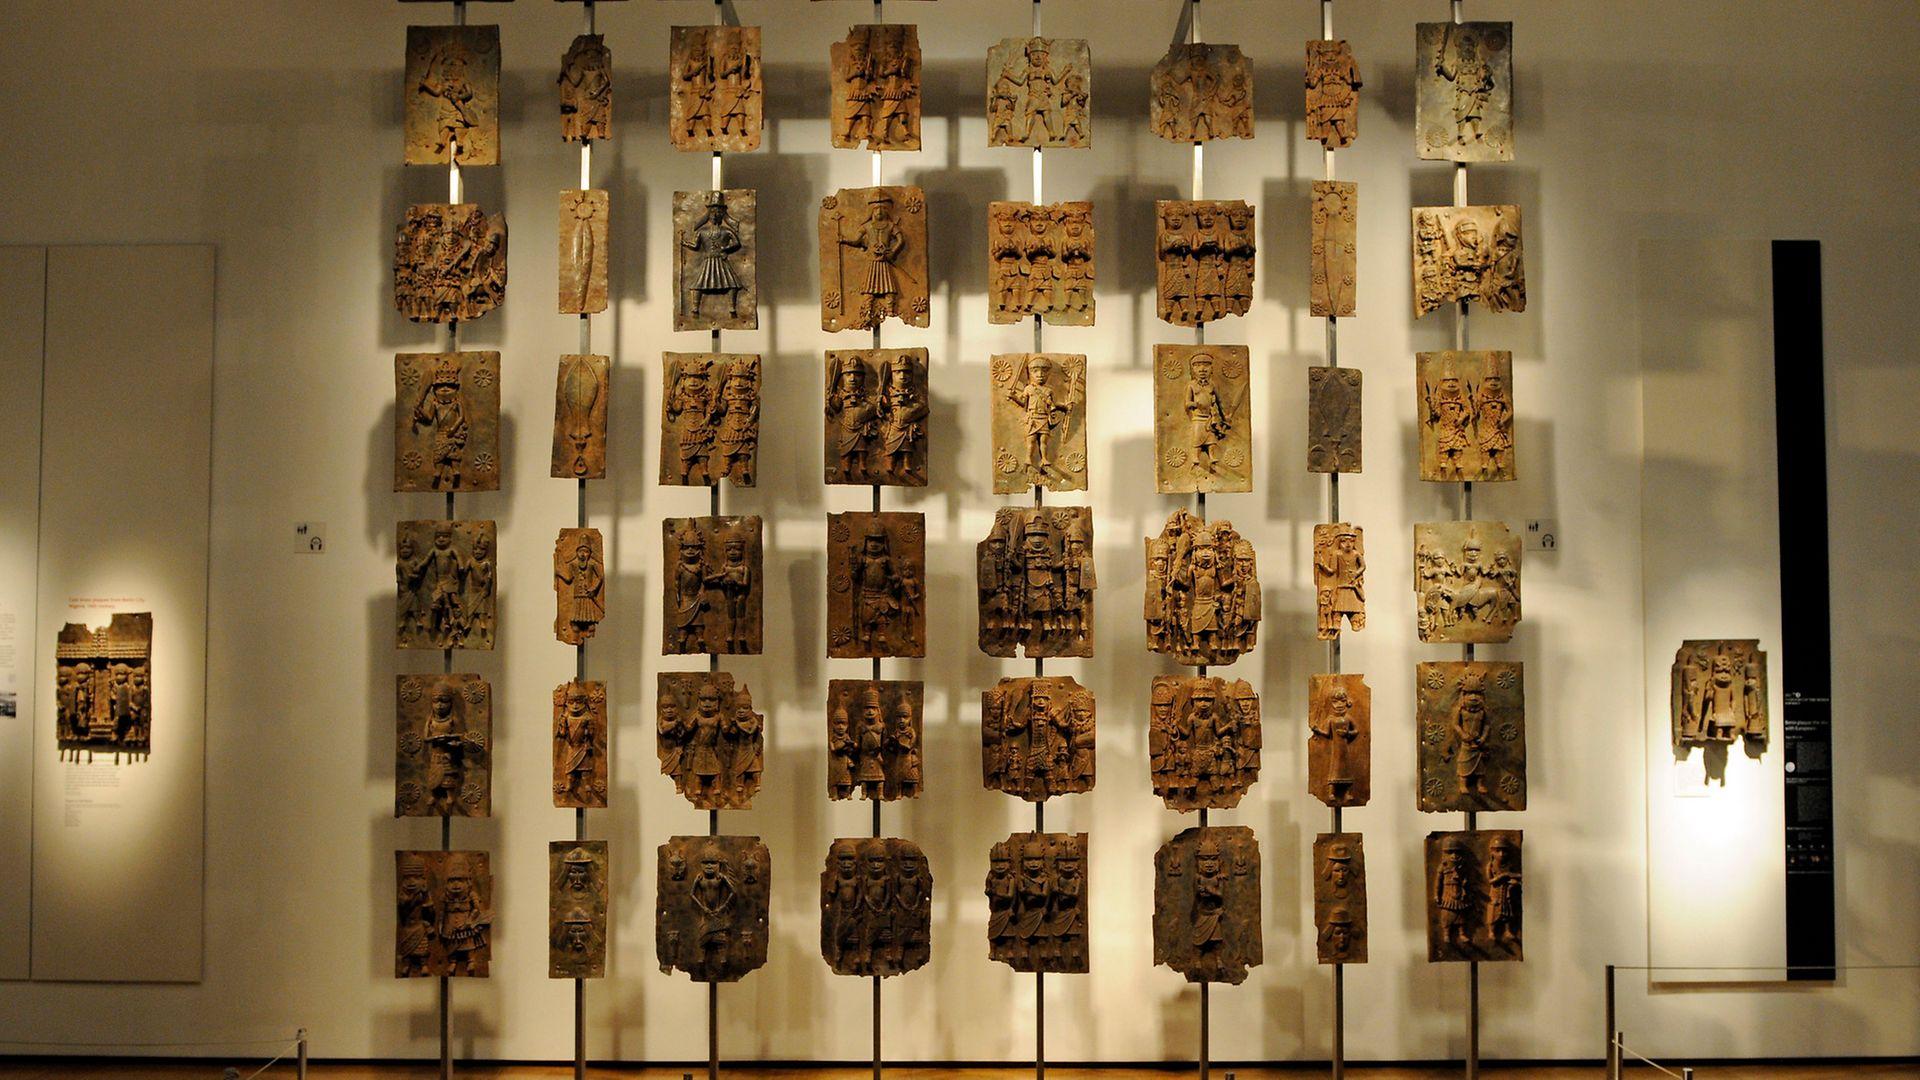 Benin Bronzes in the British Museum - Credit: Son of Groucho/Flickr